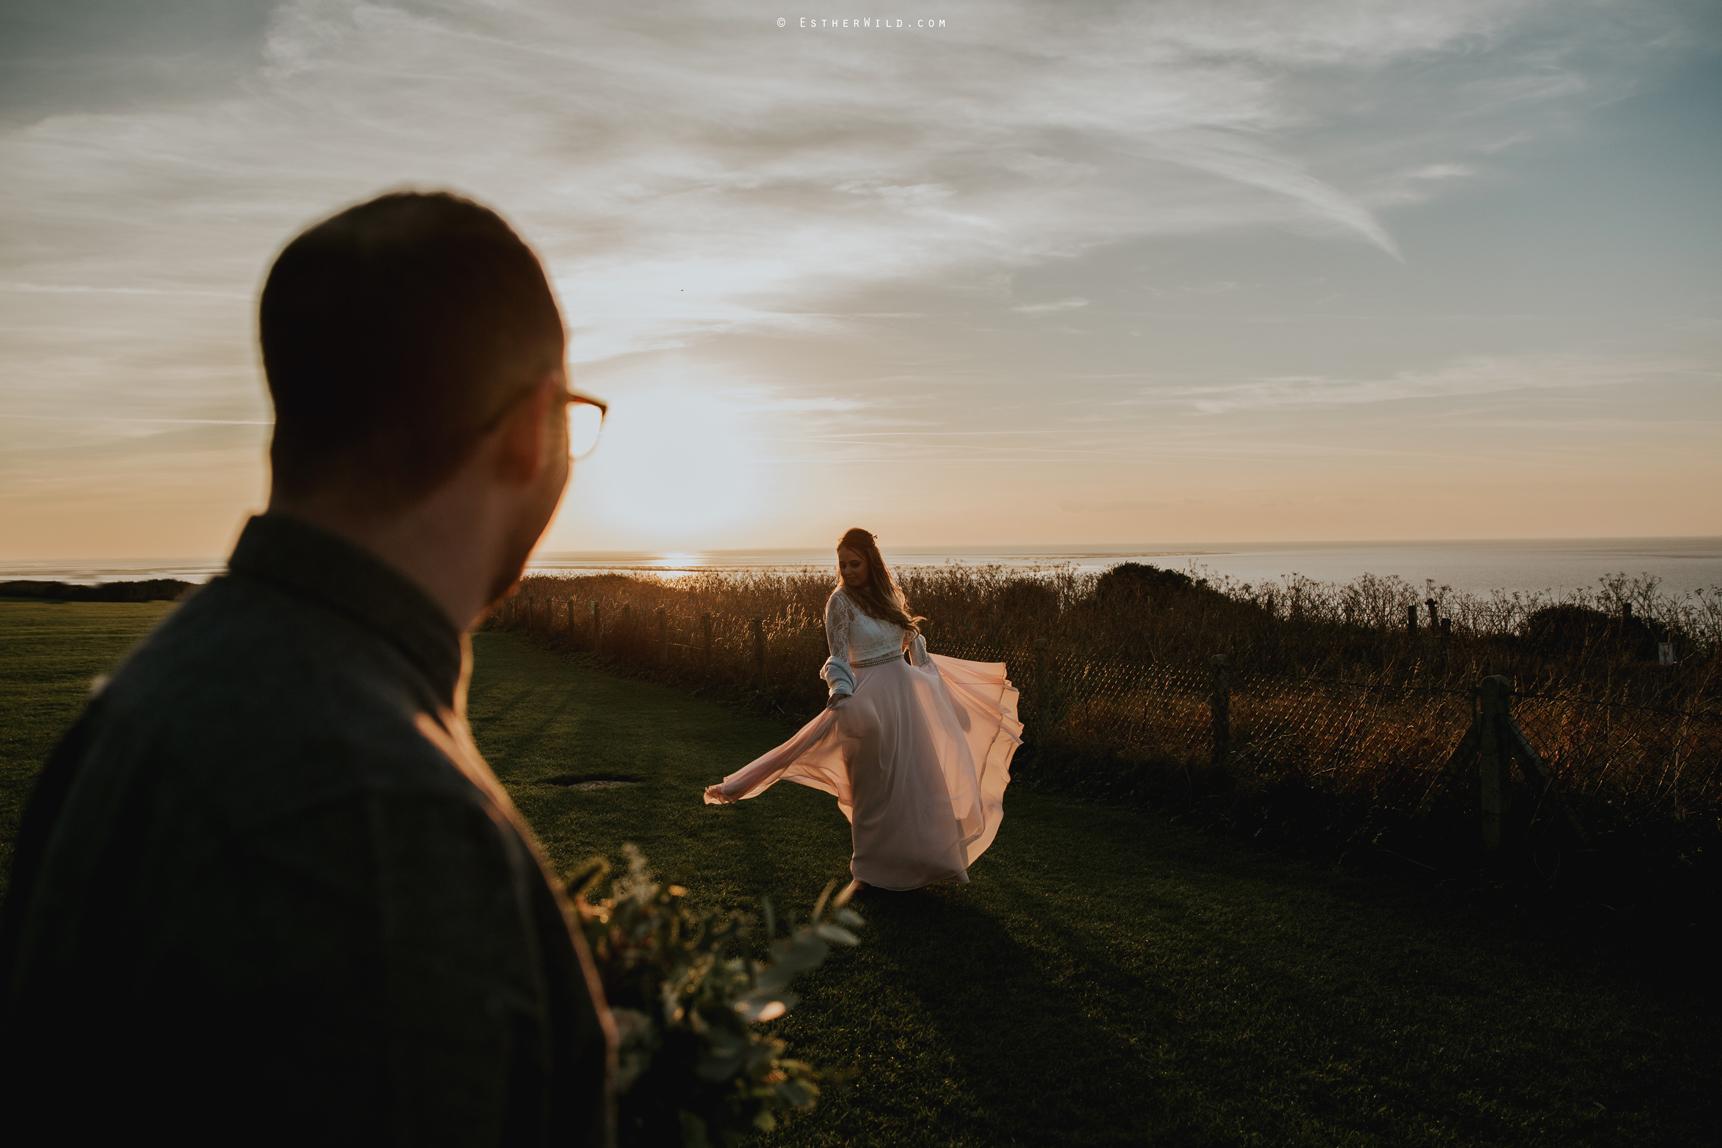 Couple_Anniversary_Wedding_Photography_Hunstanton_Norfolk_Esther_Wild_Share_Copy_IMG_9046.jpg